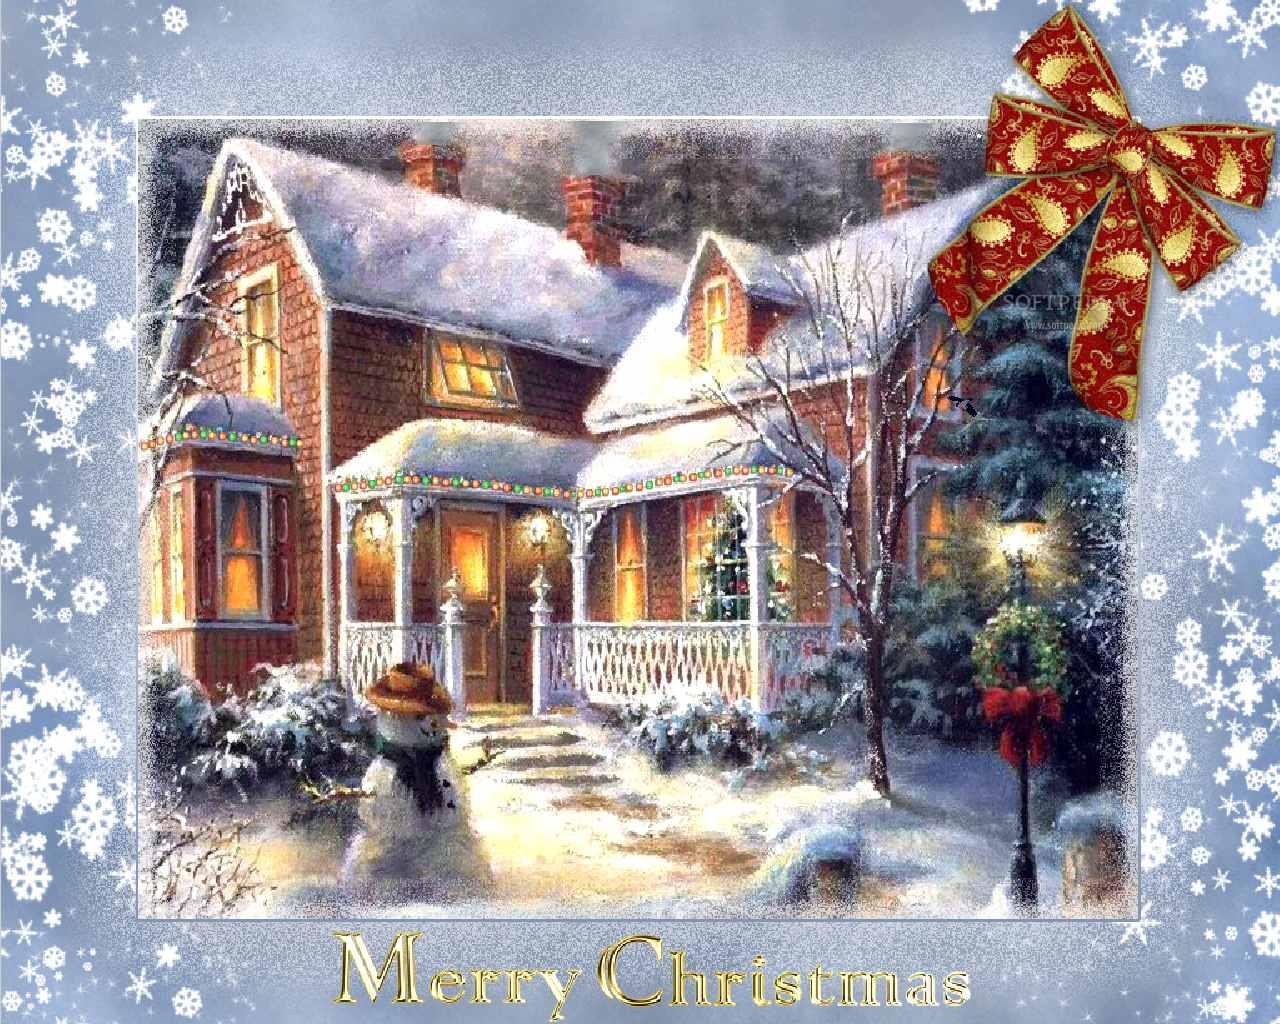 http://1.bp.blogspot.com/-z-v_7_JsCF0/TkzD3dGigGI/AAAAAAAAAGE/ZANW6r5eIUI/s1600/Christmas-Time-Animated-Wallpaper_.jpg